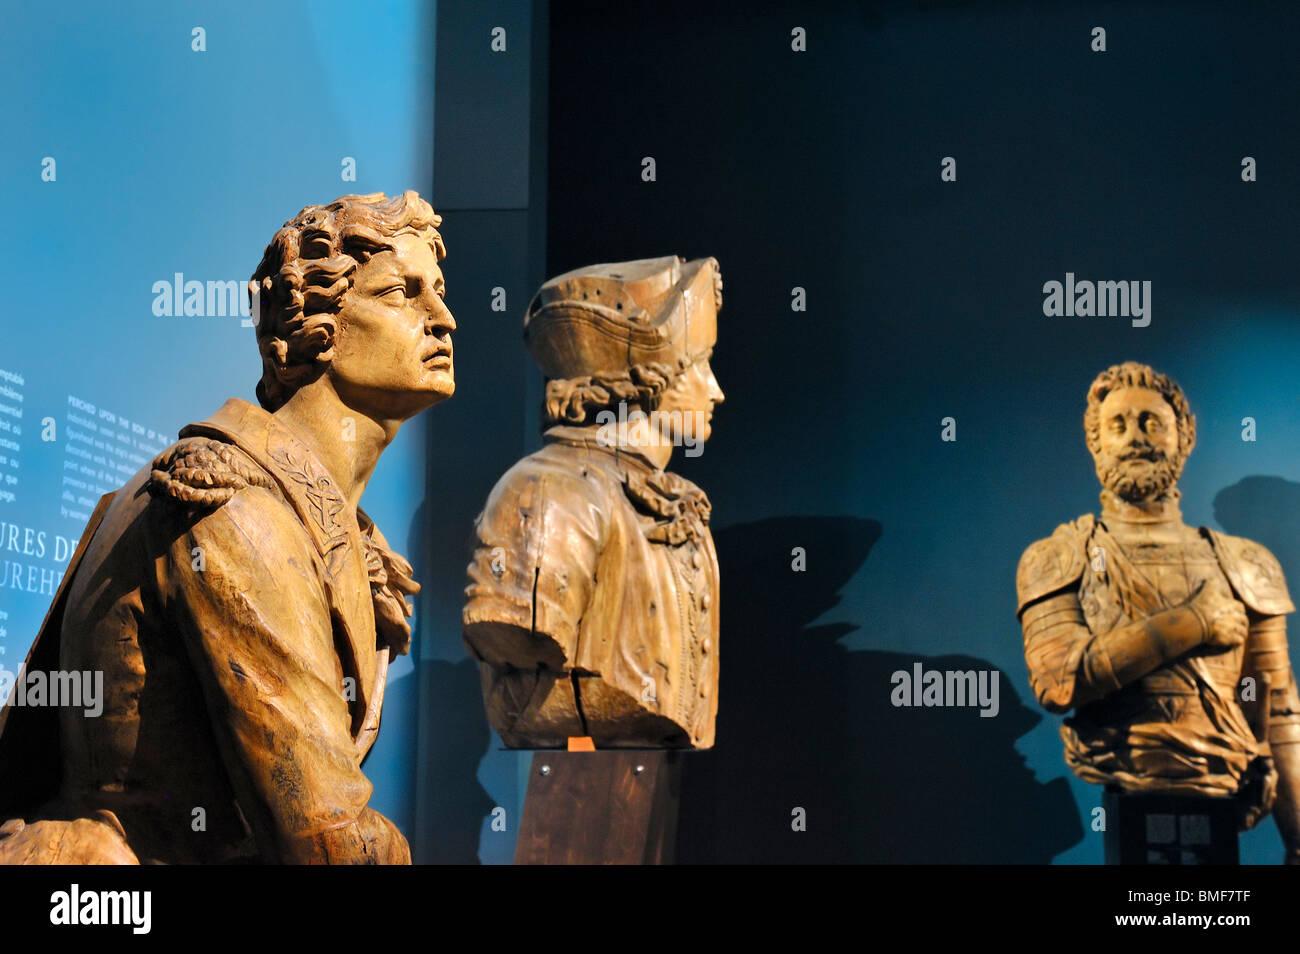 Musee de La Marine (Navy Museum), Paris, France. - Stock Image